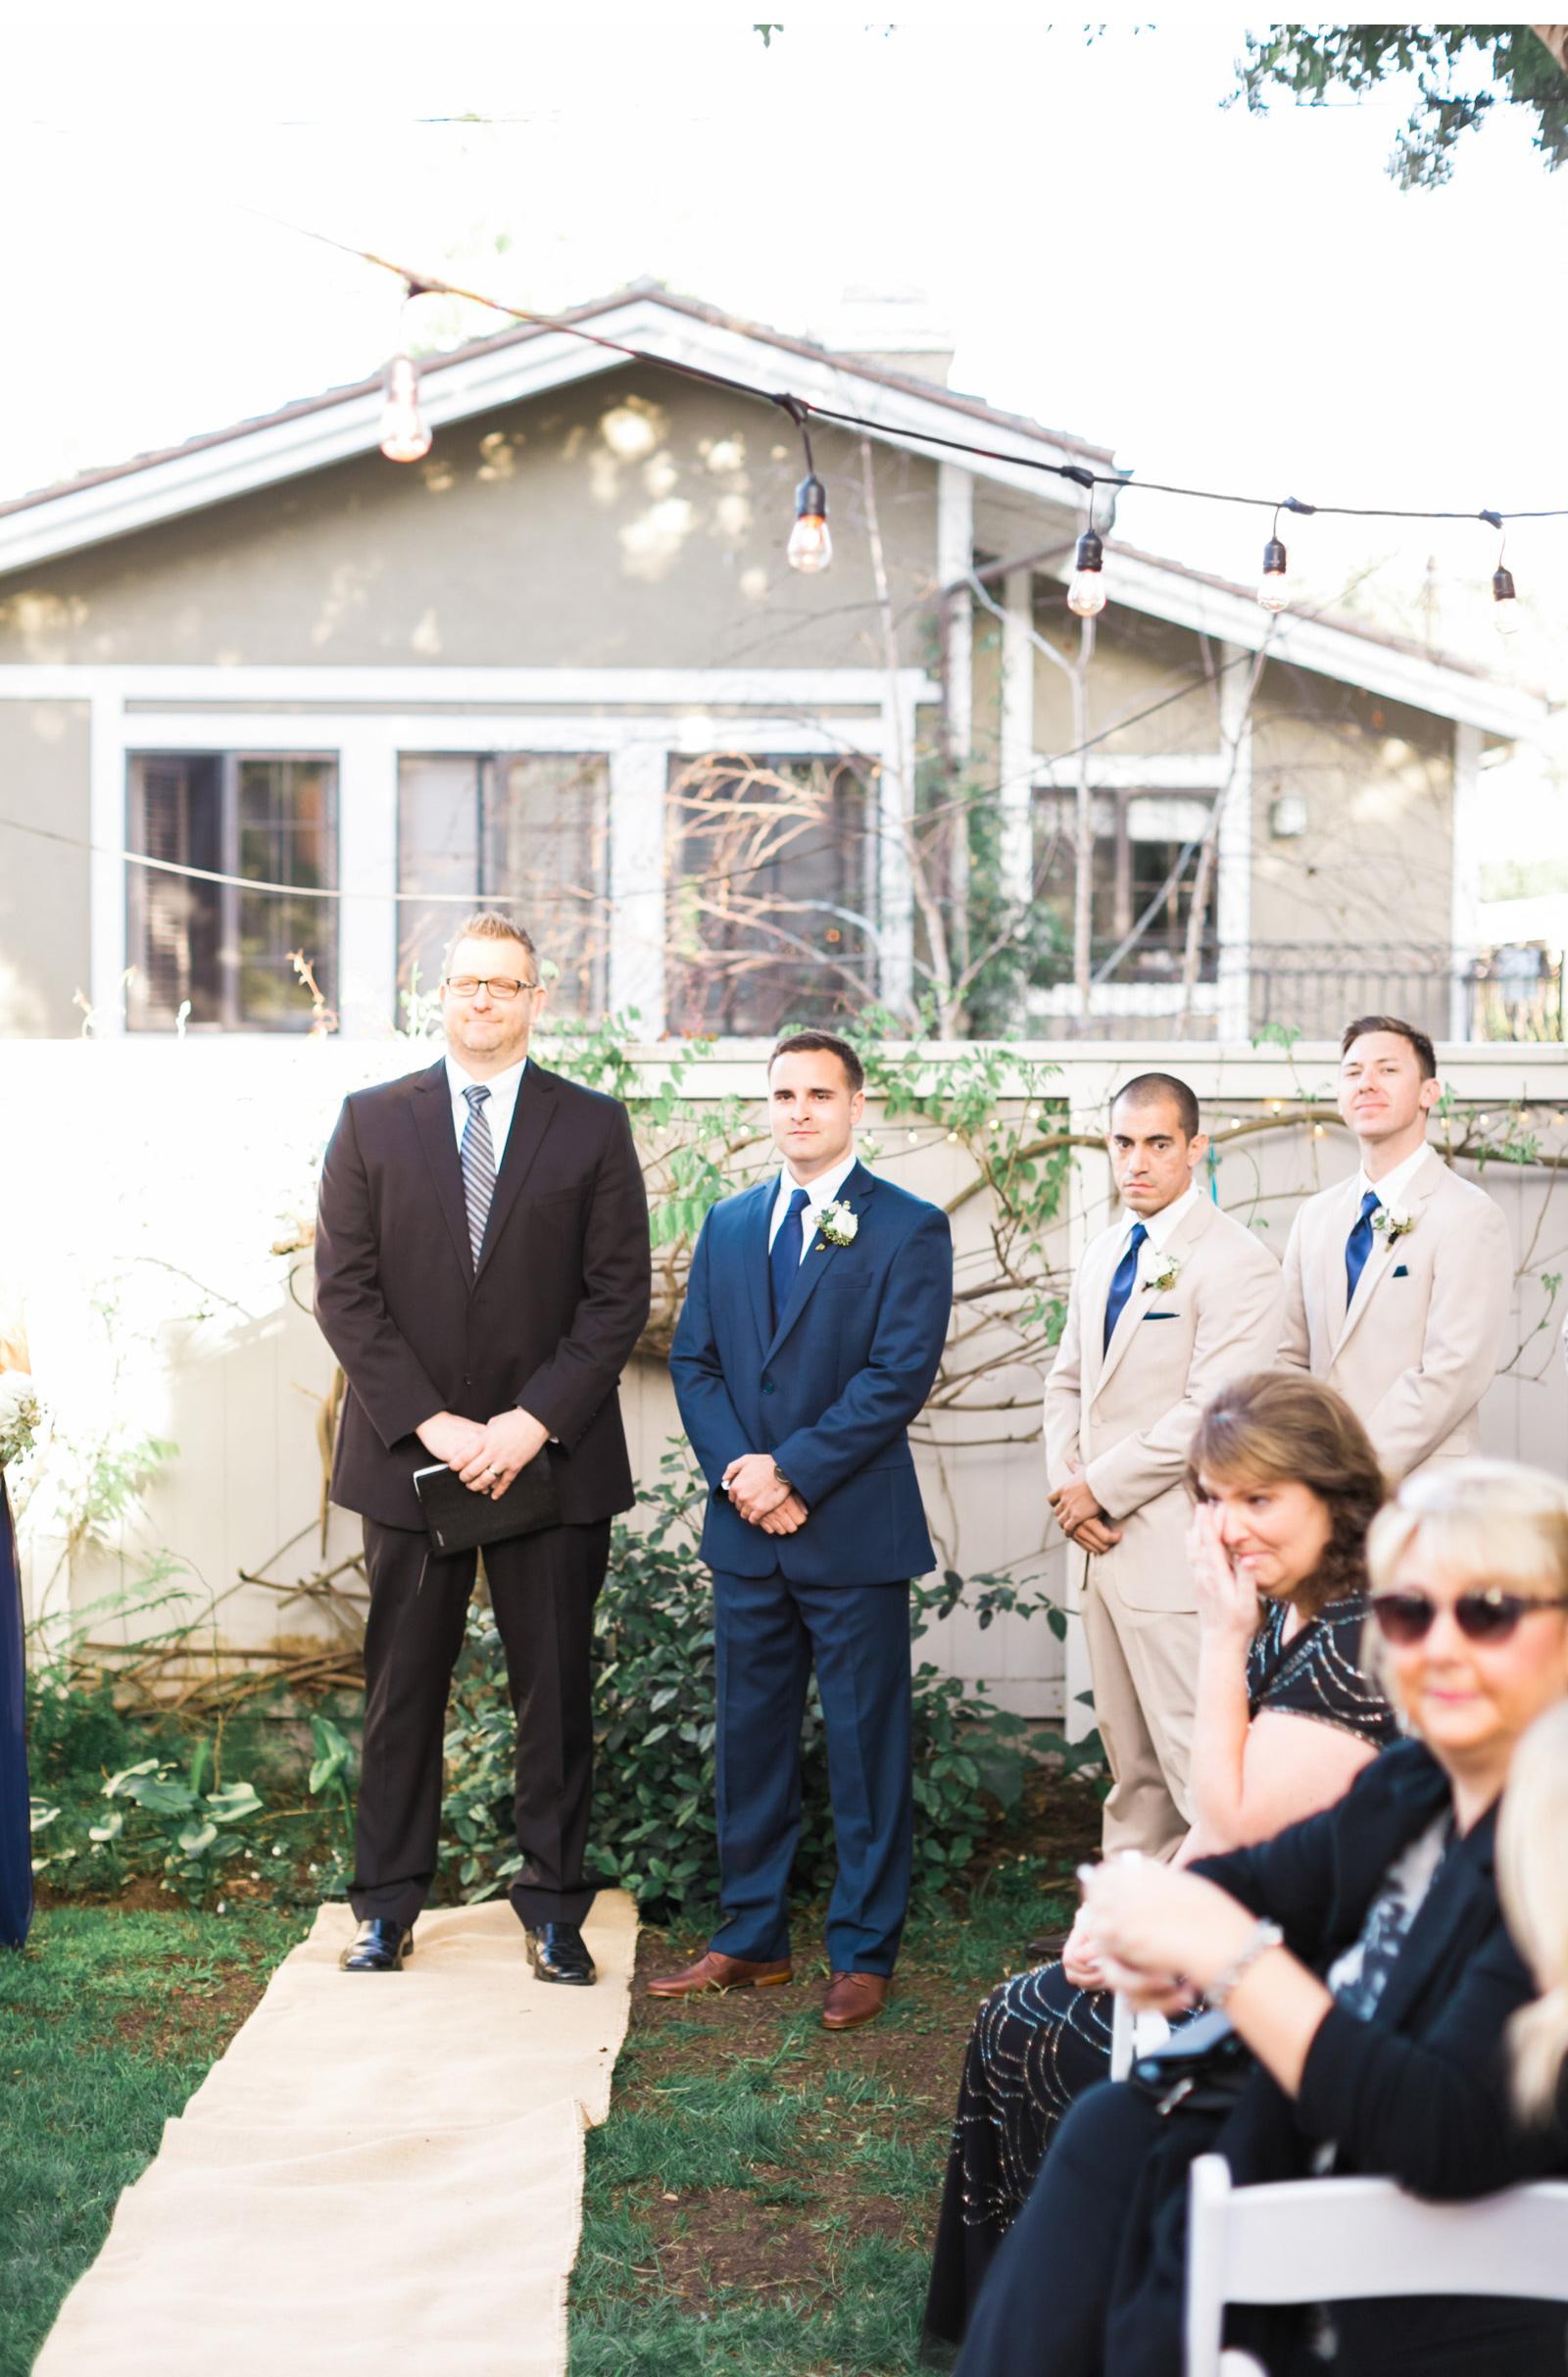 Style-Me-Pretty-Backyard-Wedding-Natalie-Schutt-Photography_02.jpg